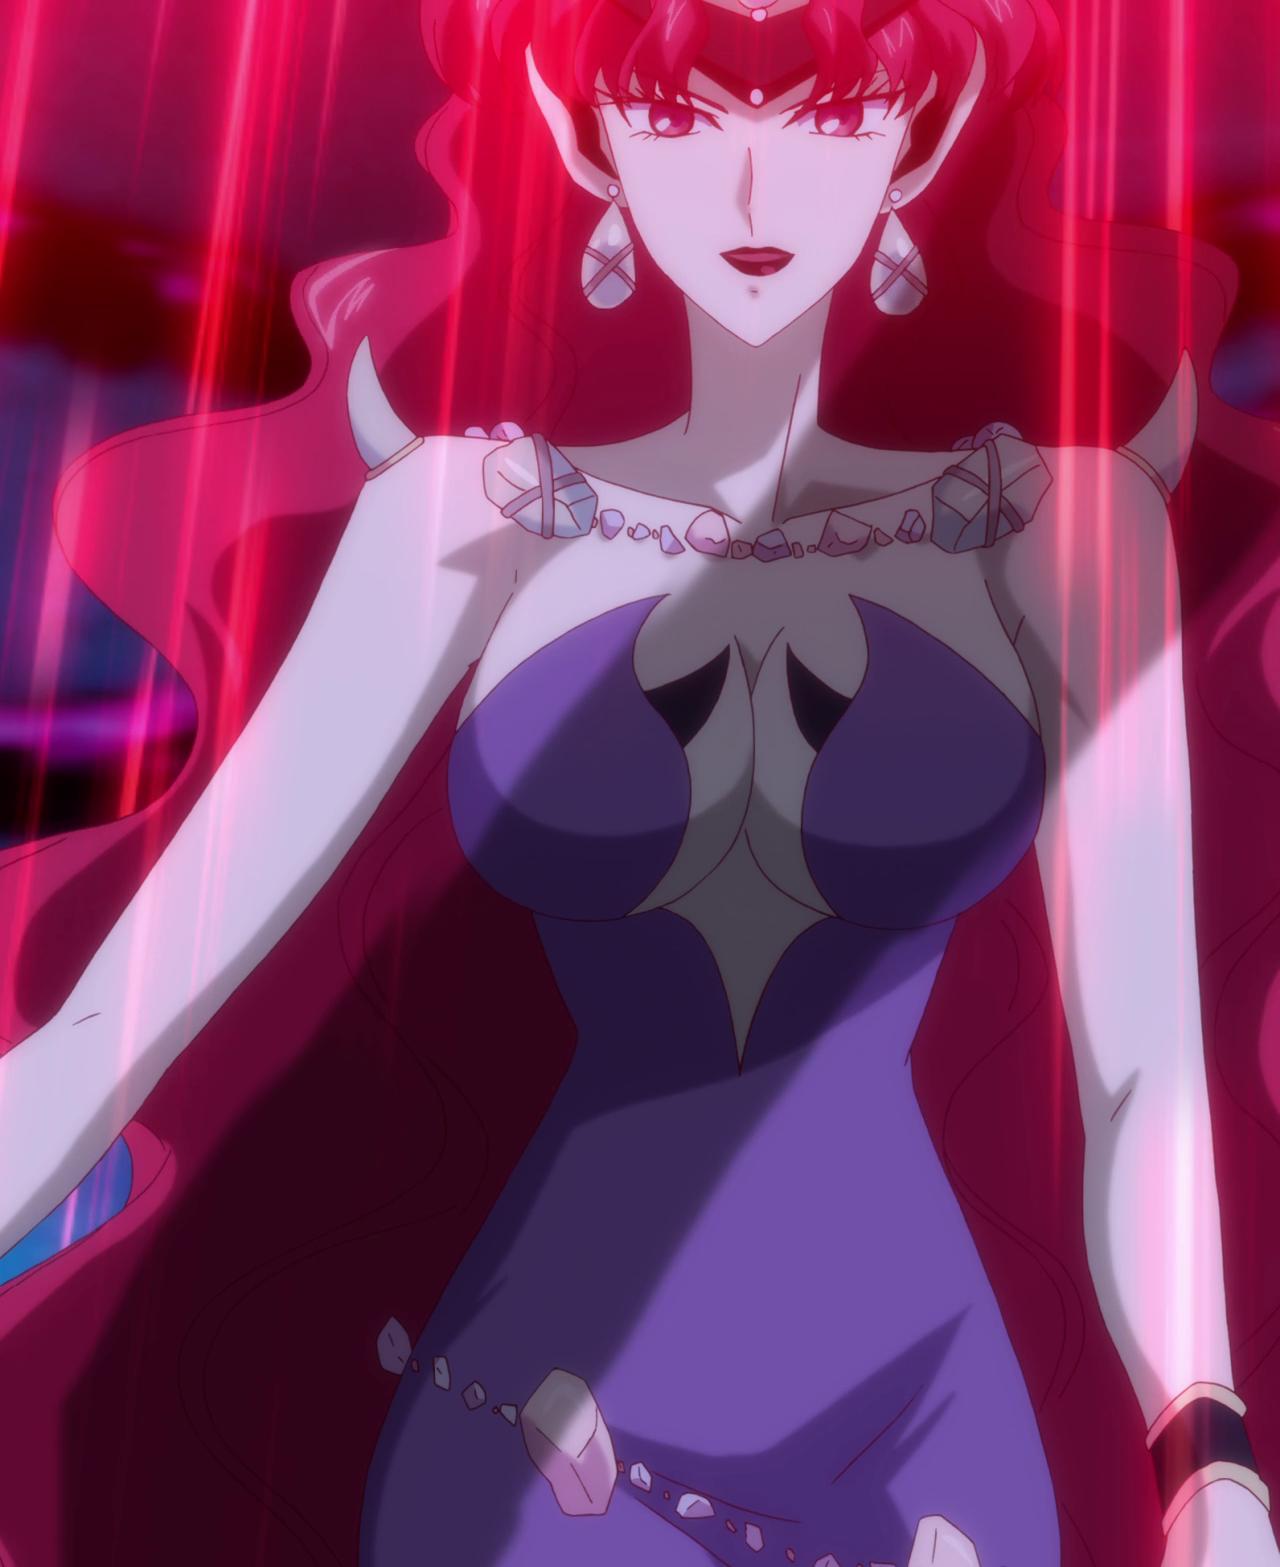 Queen Beryl Crystal Sailor Moon Wiki Fandom Powered